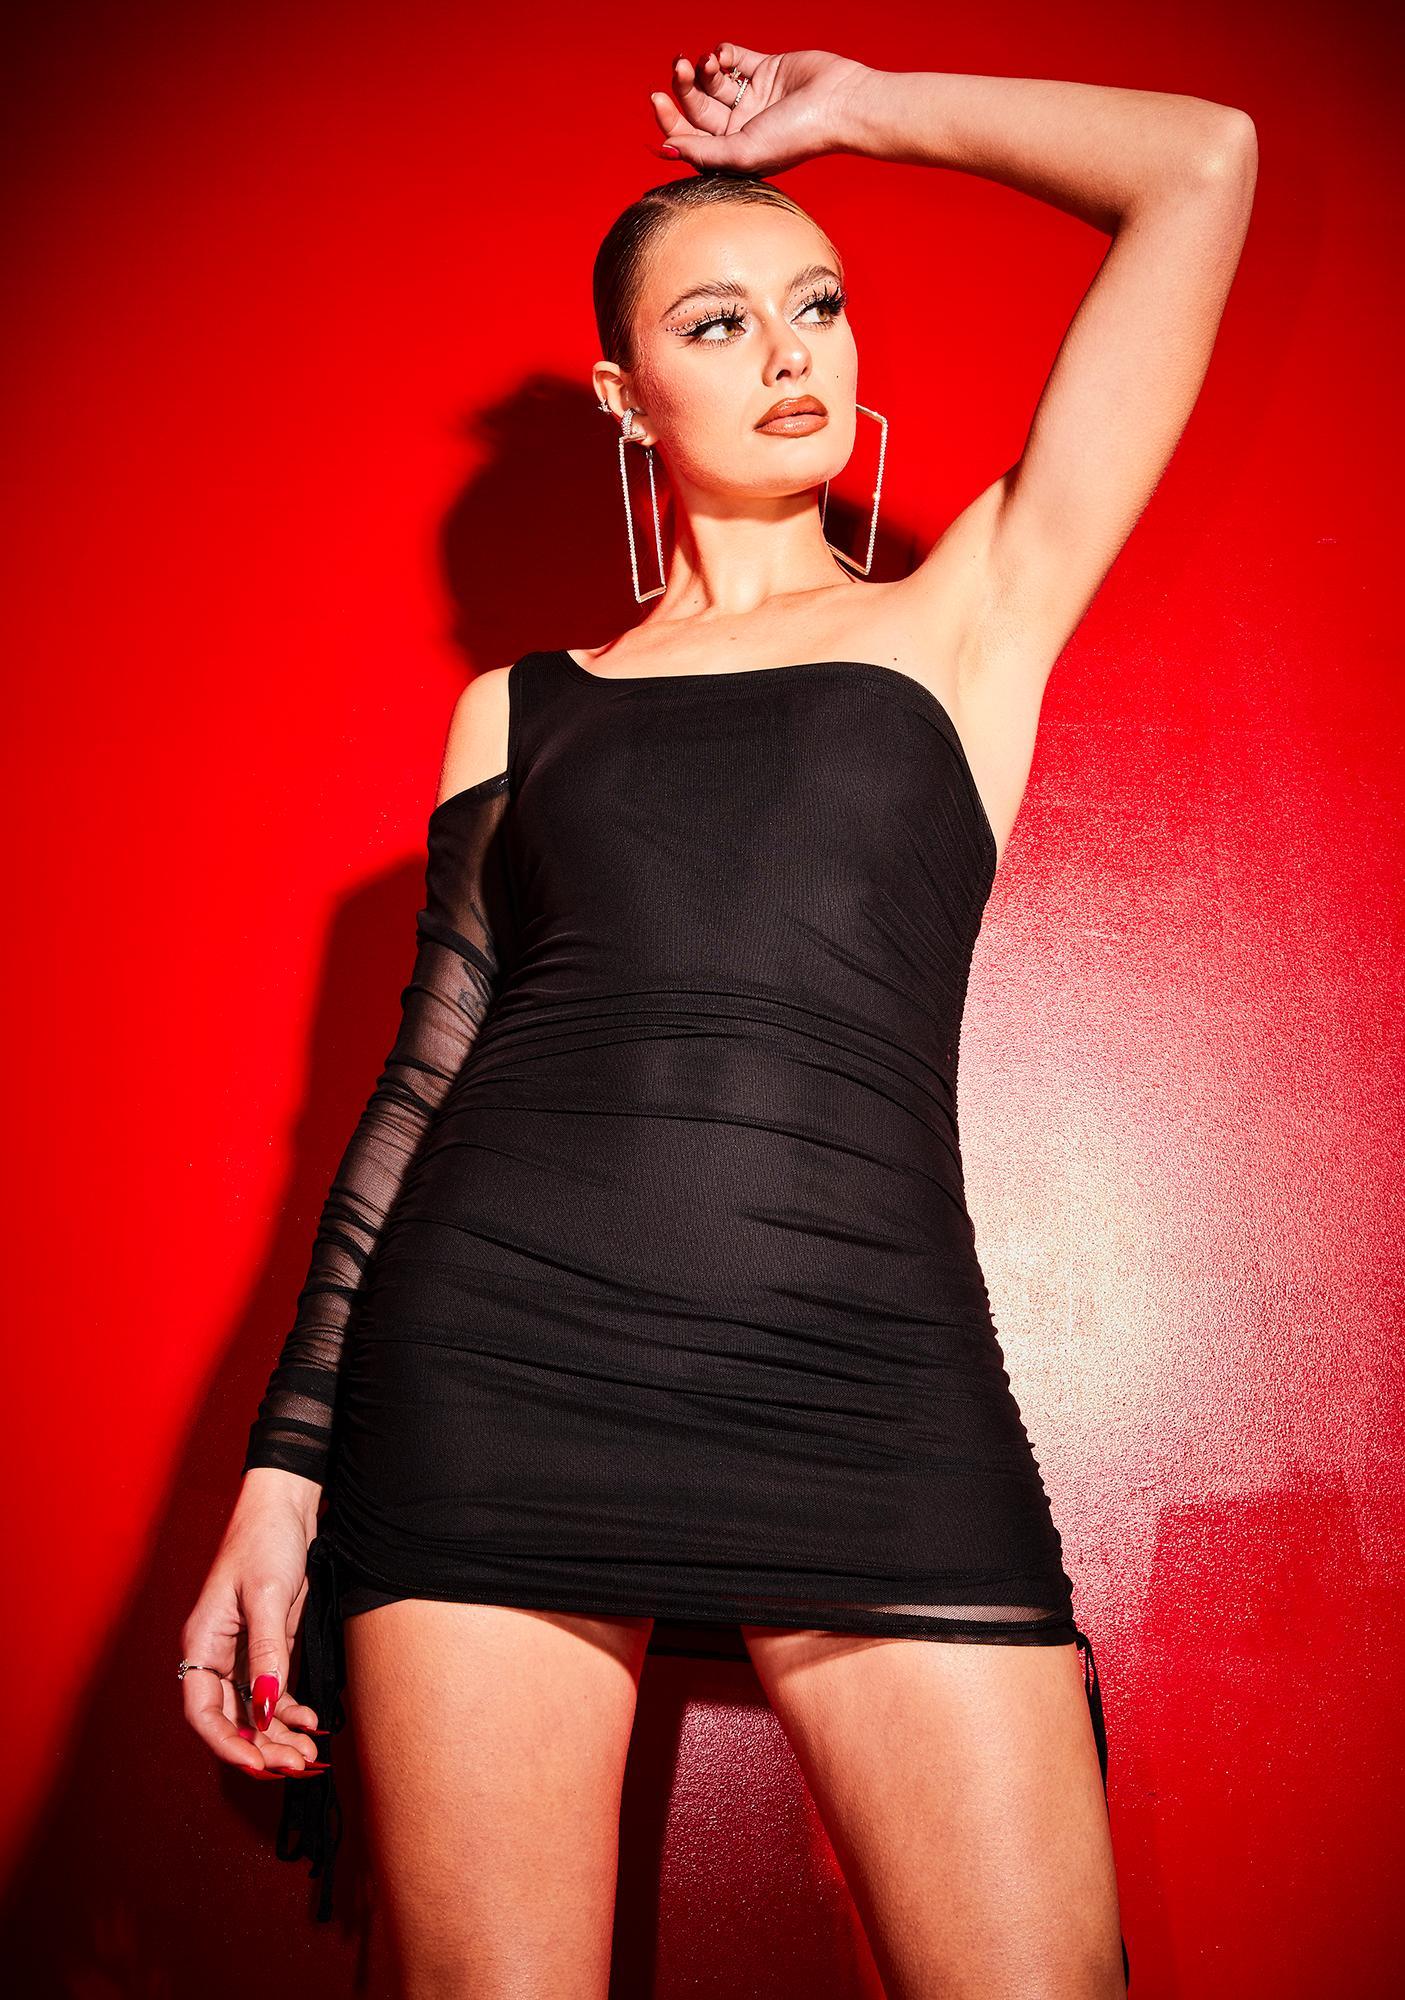 Poster Grl Royal Tartness Cutout Sleeve Mesh Dress